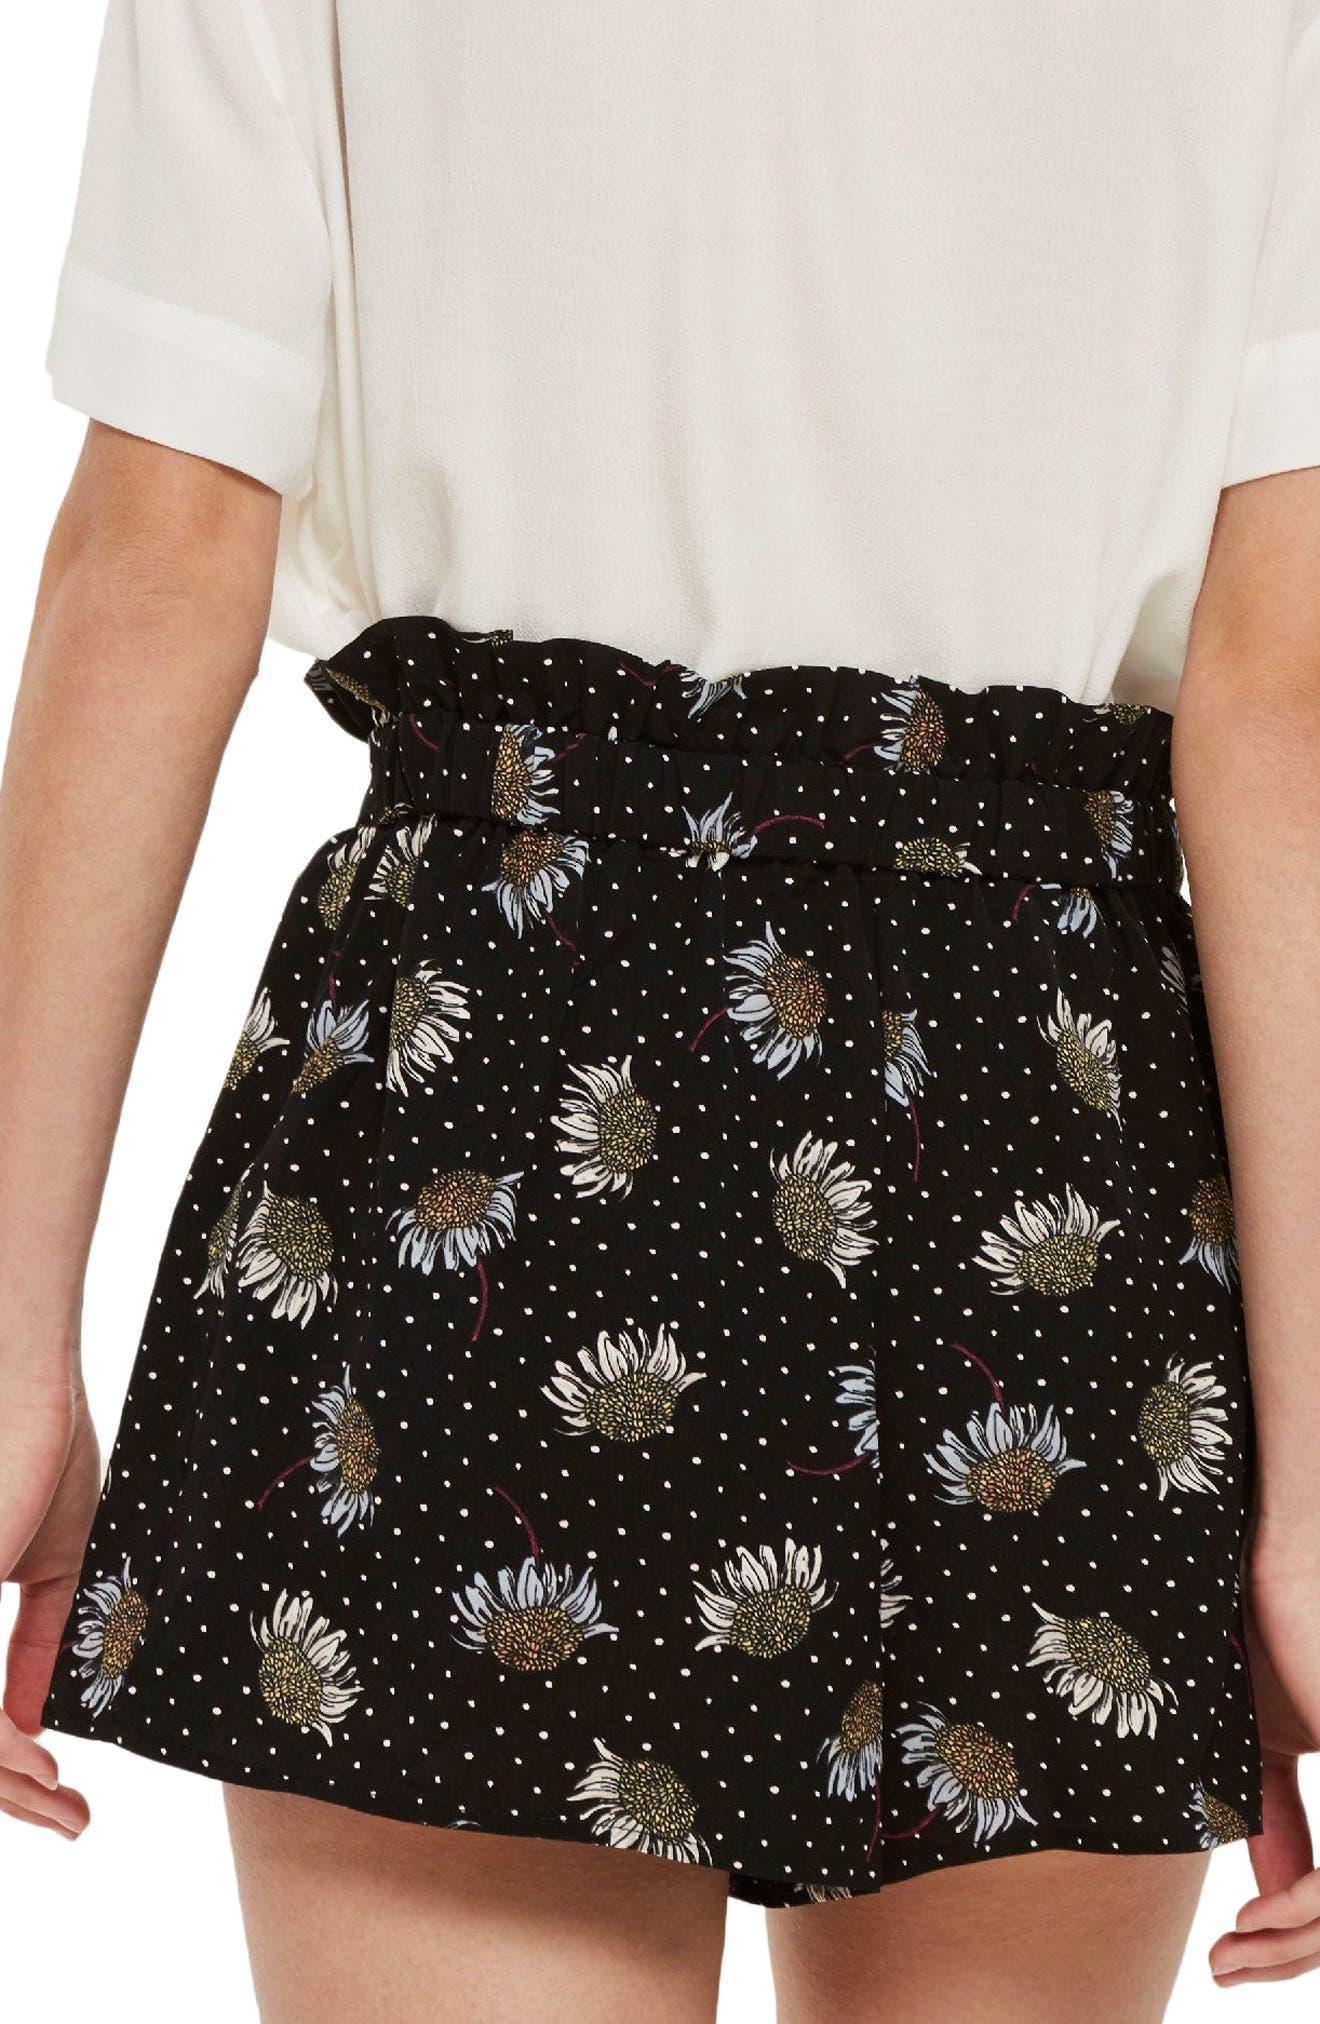 Daisy Print Frill Waist Shorts,                             Alternate thumbnail 3, color,                             Black Multi